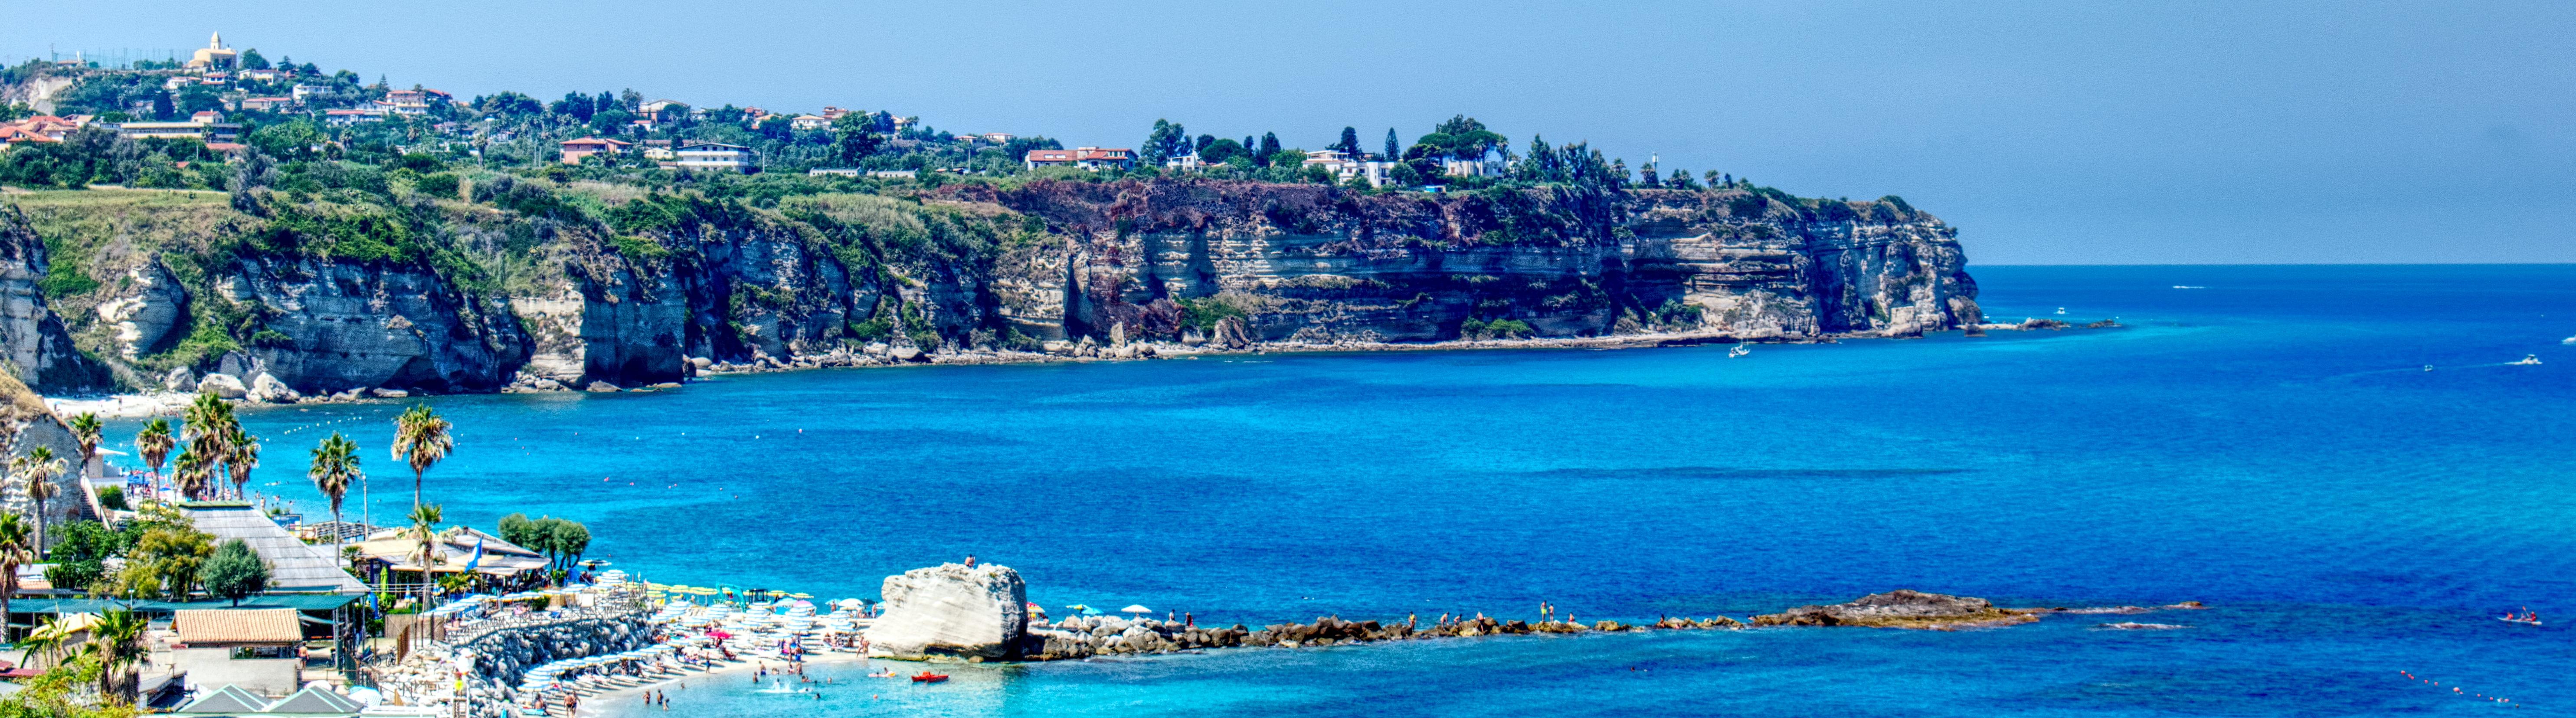 Estate 2021: Ryanair punta sulla Calabria